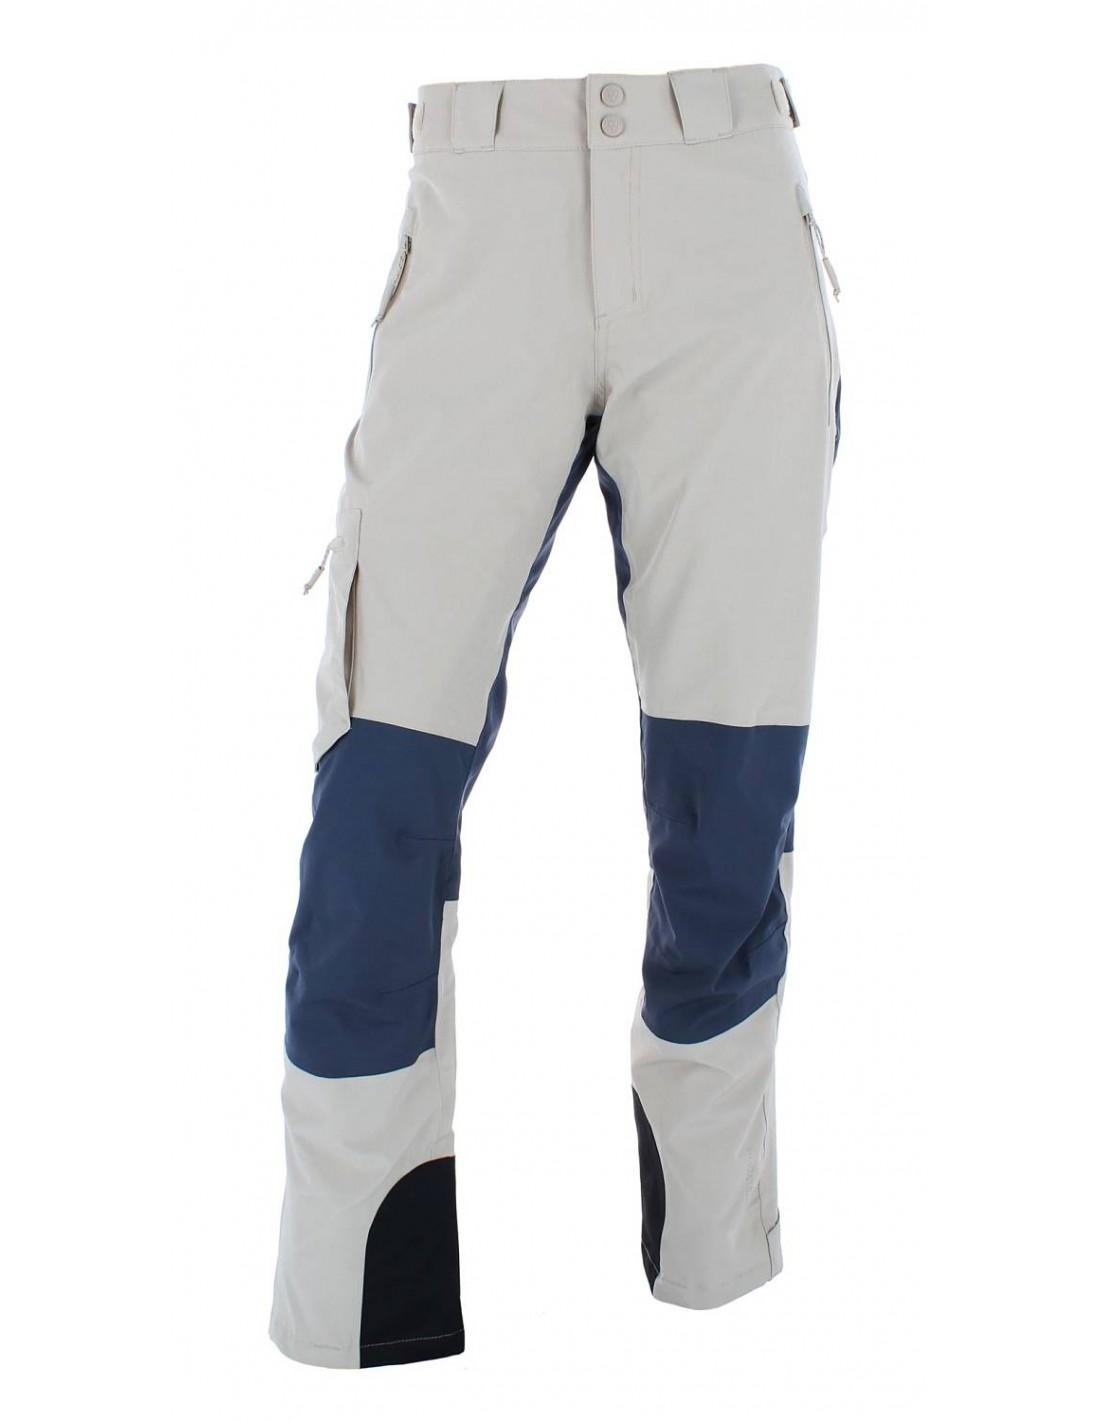 400833e9 VI20283; Friluftsbukser Damer Vikafjell Odda Multi Pant Dame SportsDeal!  VI20283